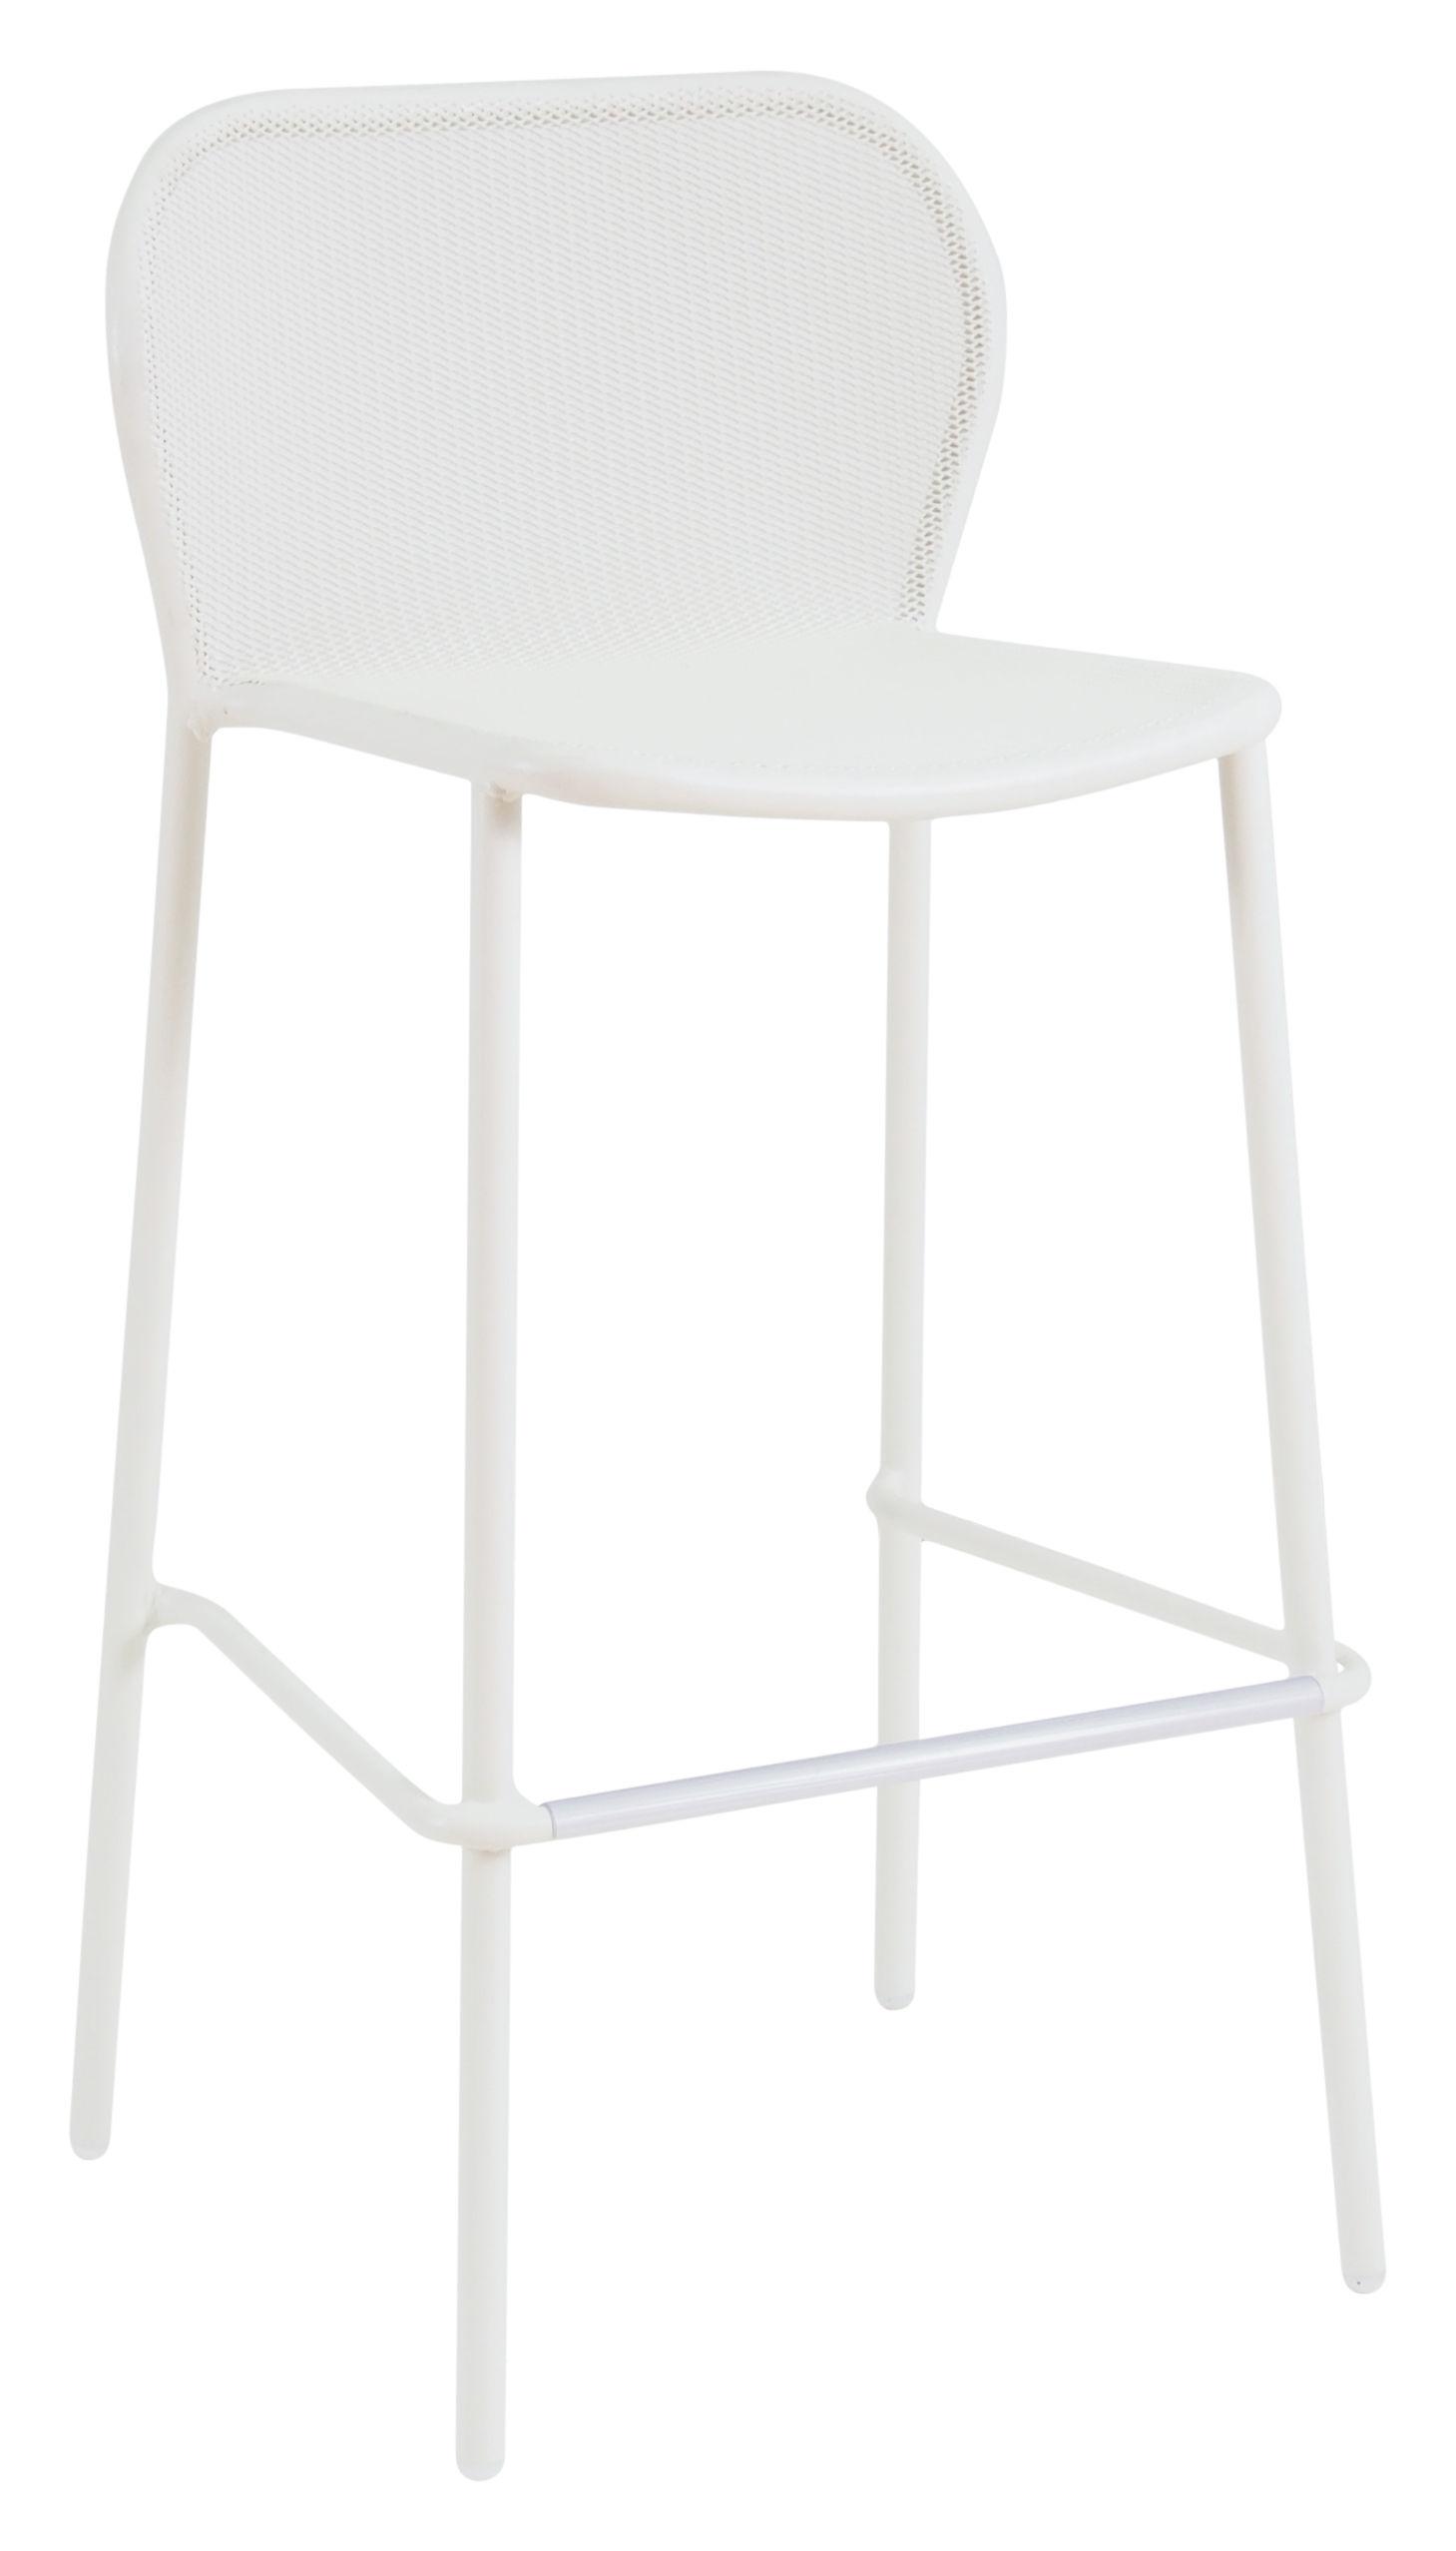 Möbel - Barhocker - Darwin Hochstuhl / H 75 cm - Metall - Emu - Weiß - gefirnister Stahl